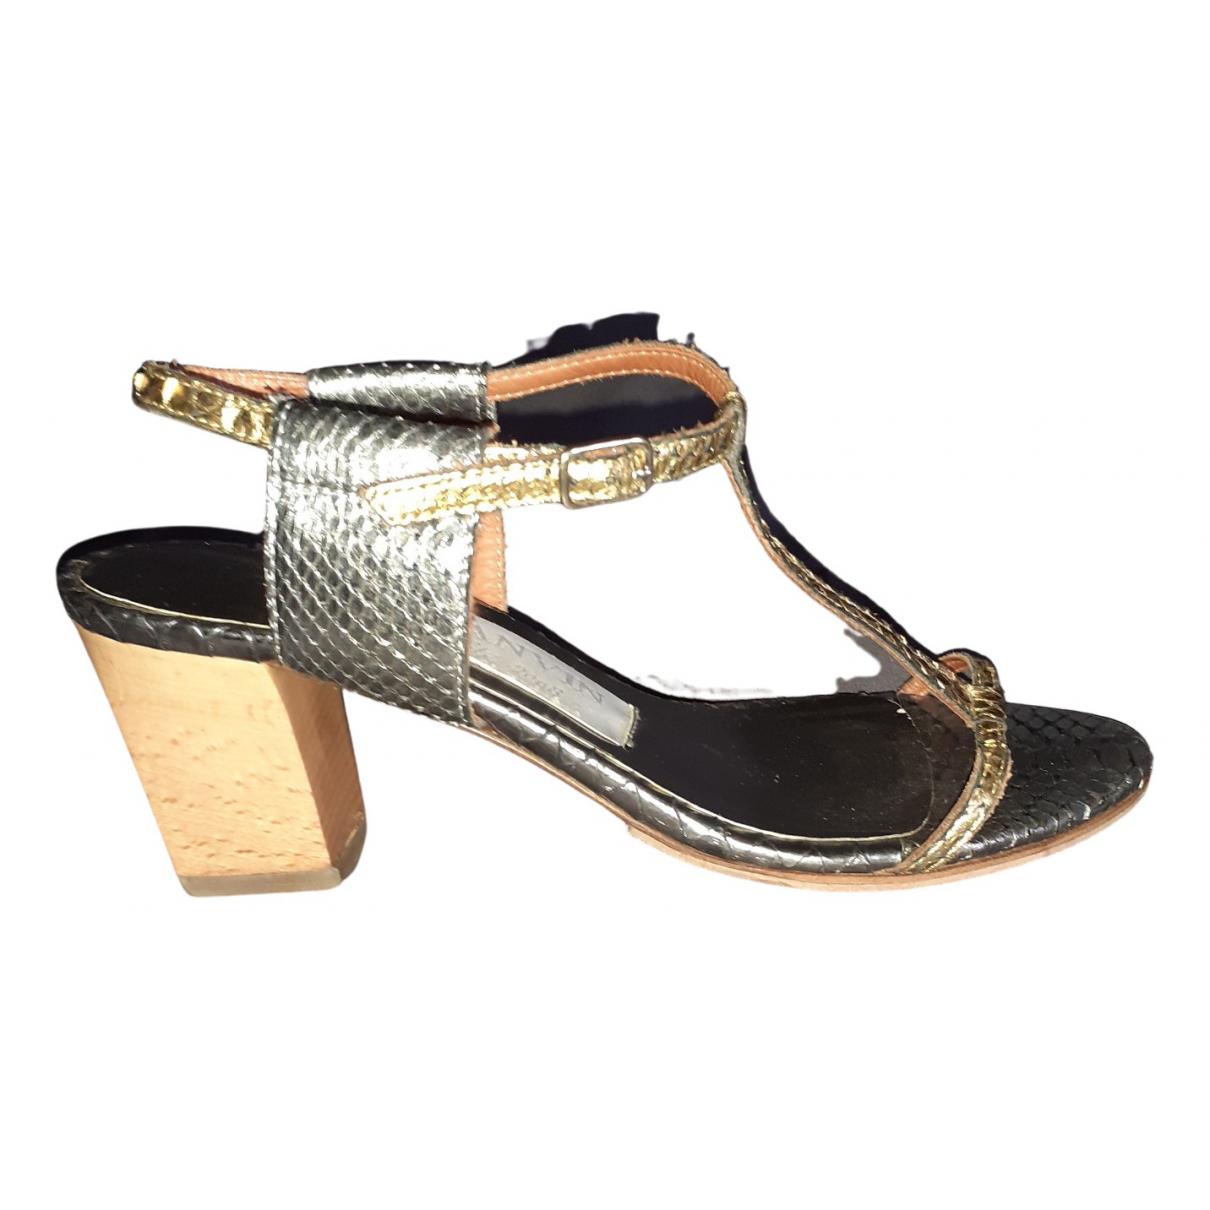 Lanvin N Metallic Python Sandals for Women 38 EU